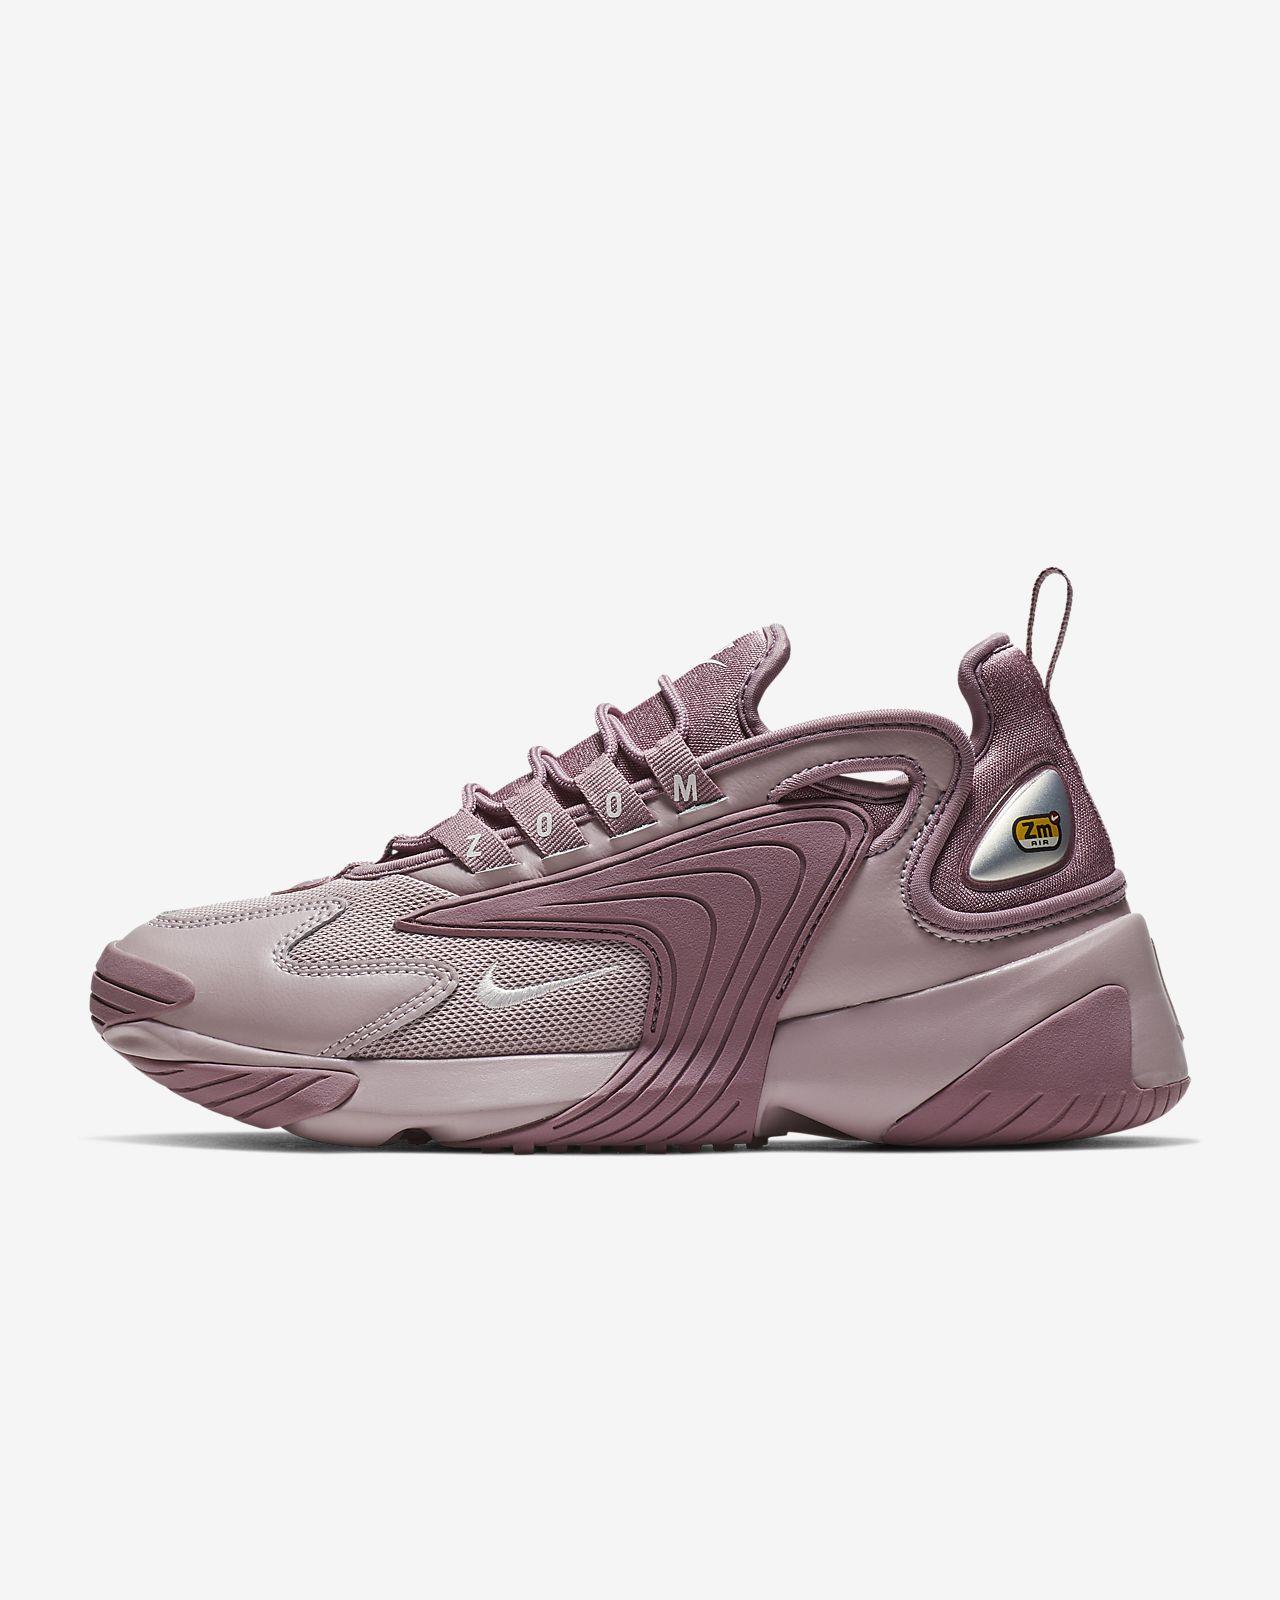 5f04a0b4b2a Chaussure Nike Zoom 2K pour Femme. Nike.com CA